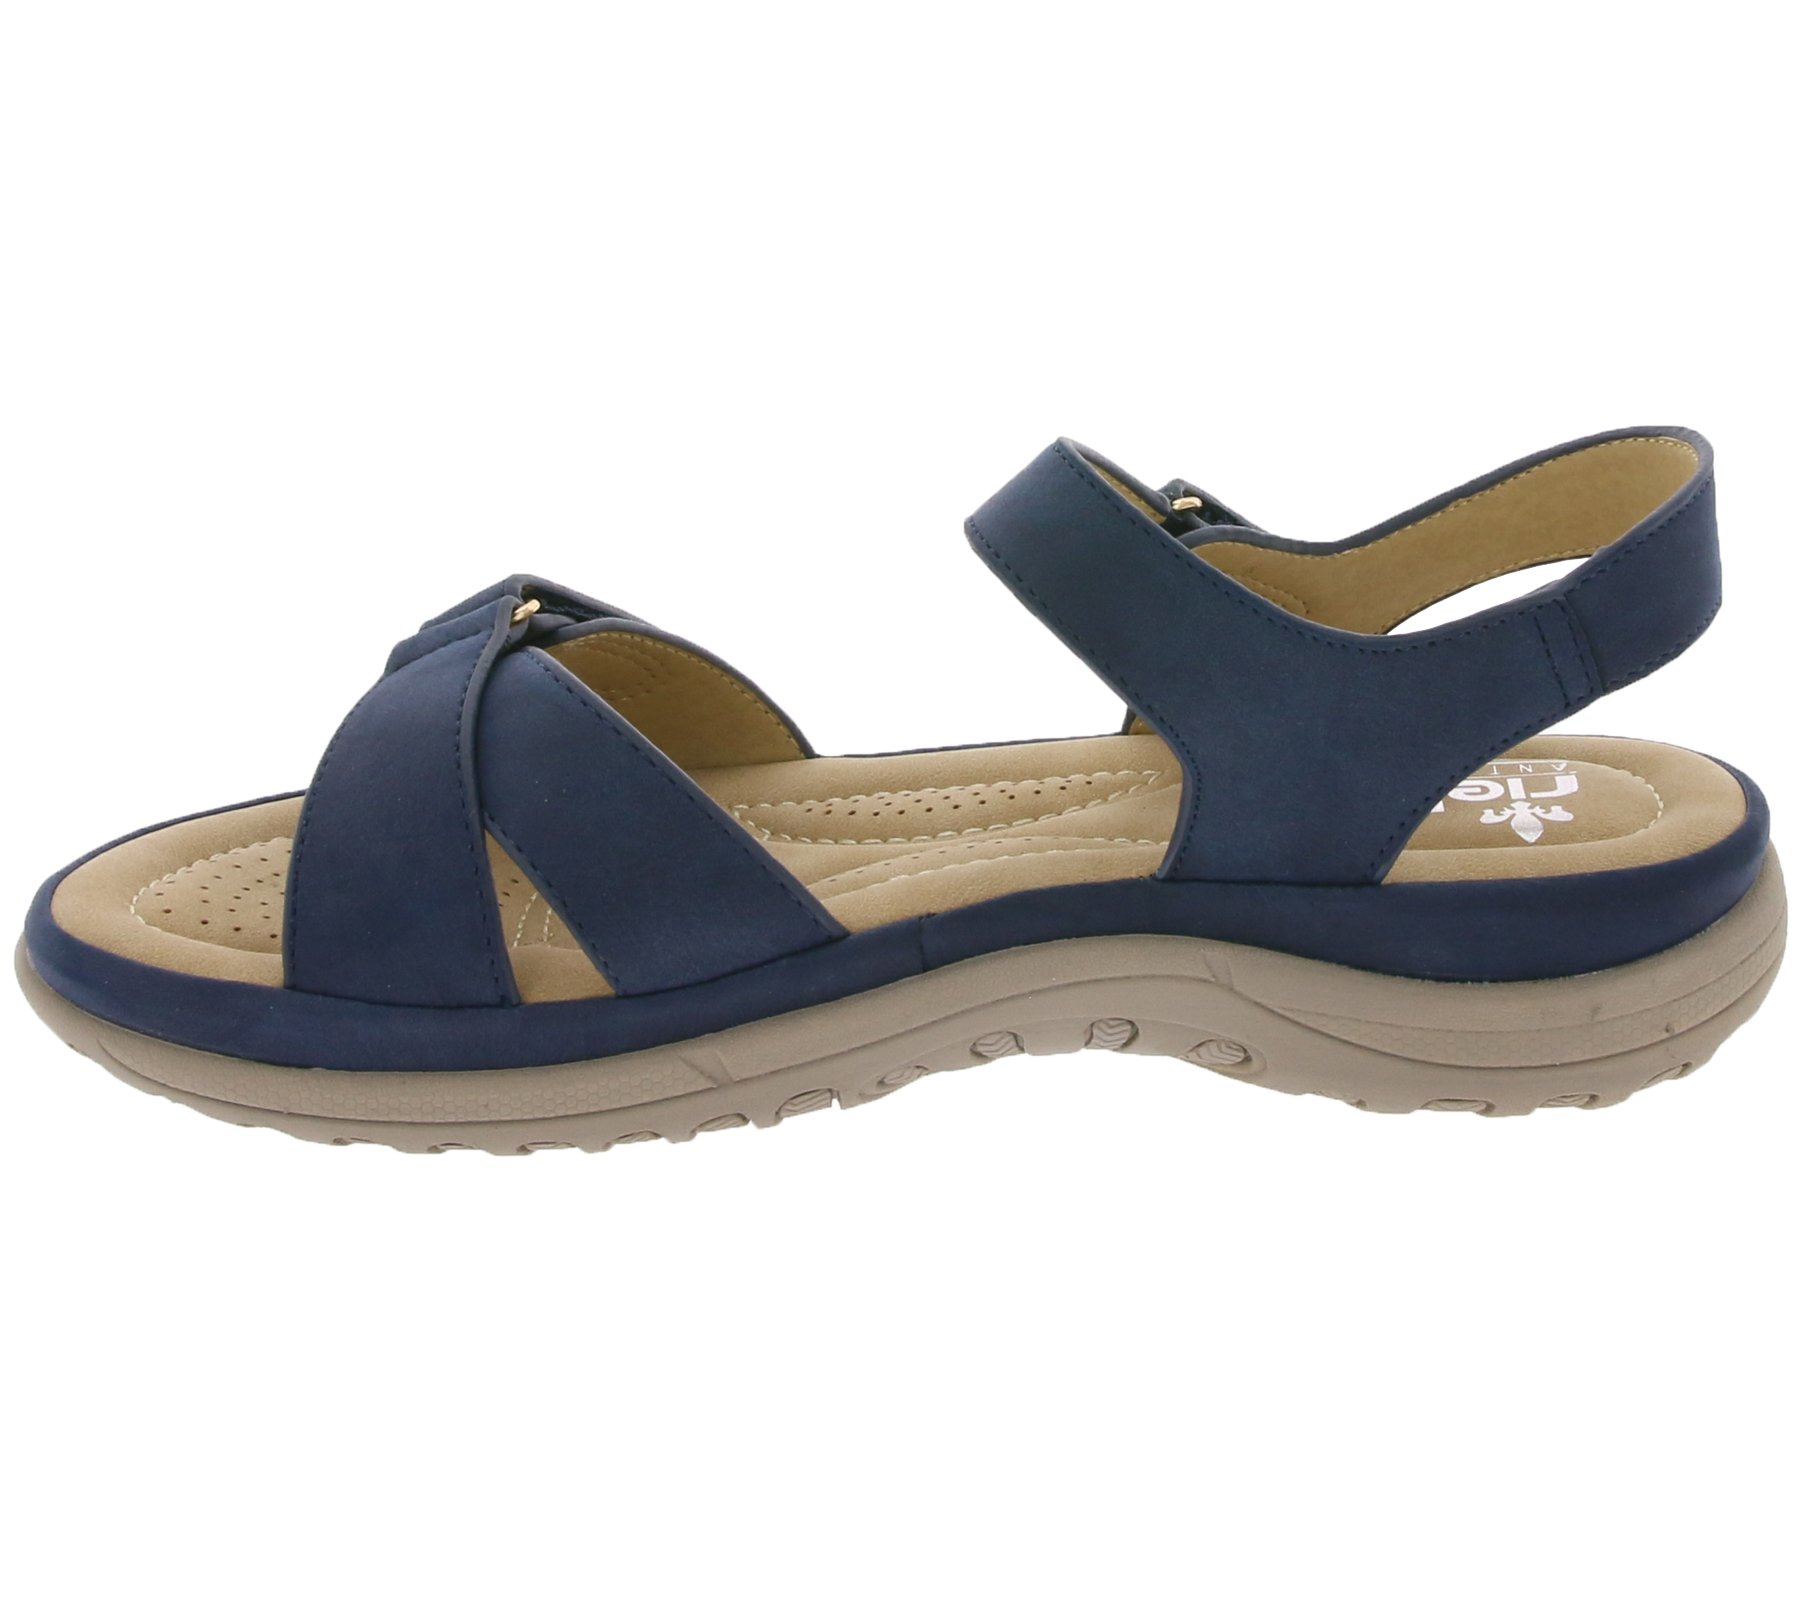 Details zu rieker Schuhe Sandalette funktionelle Damen Sandale Dunkelblau